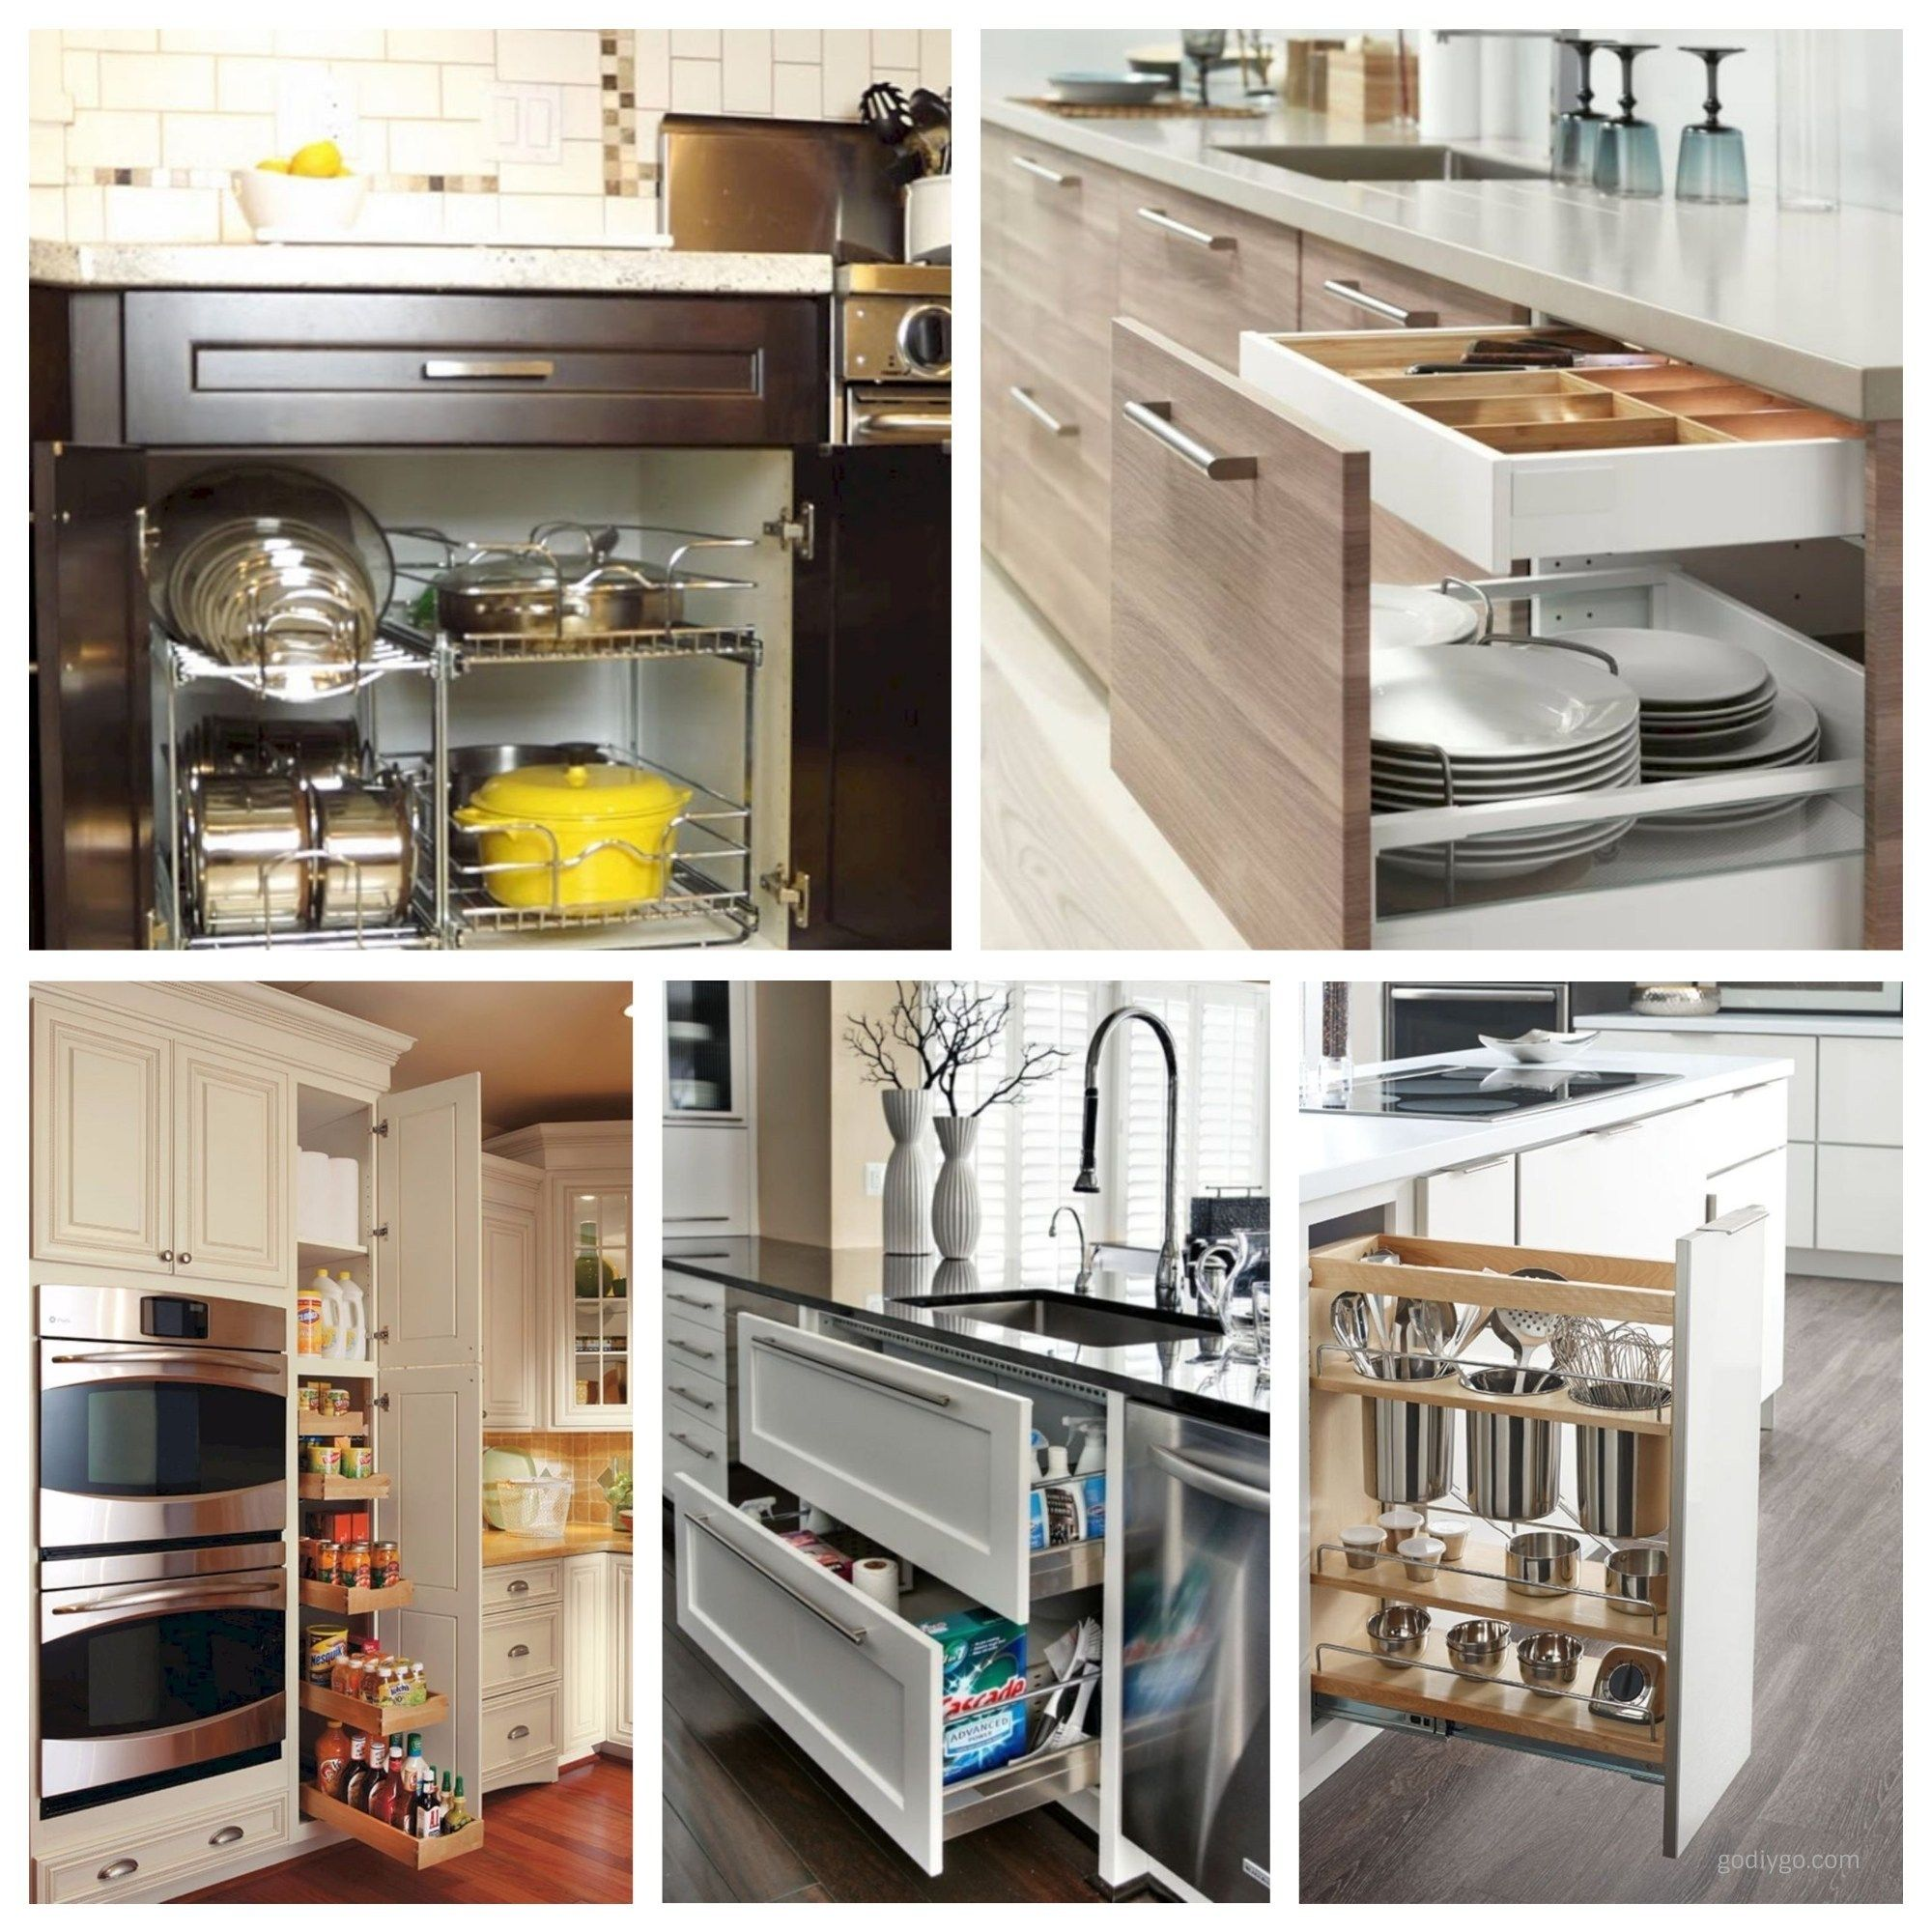 44 smart kitchen cabinet organization ideas small kitchen cabinets smart kitchen kitchen on kitchen counter organization id=96947